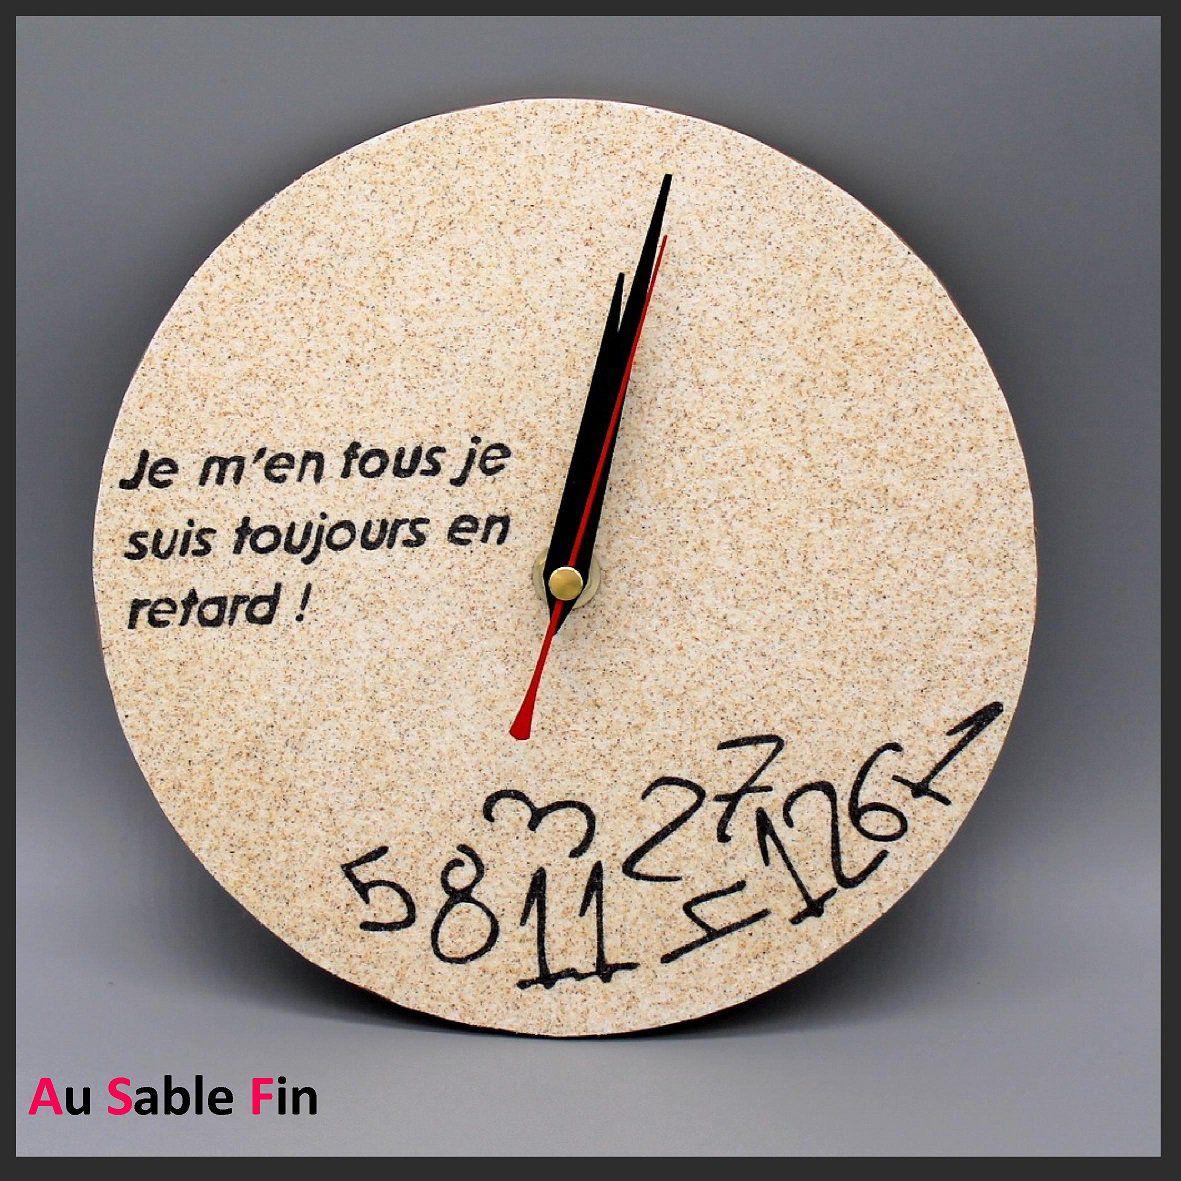 Horloge En Sable - En Retard! intérieur Dessin D Horloge